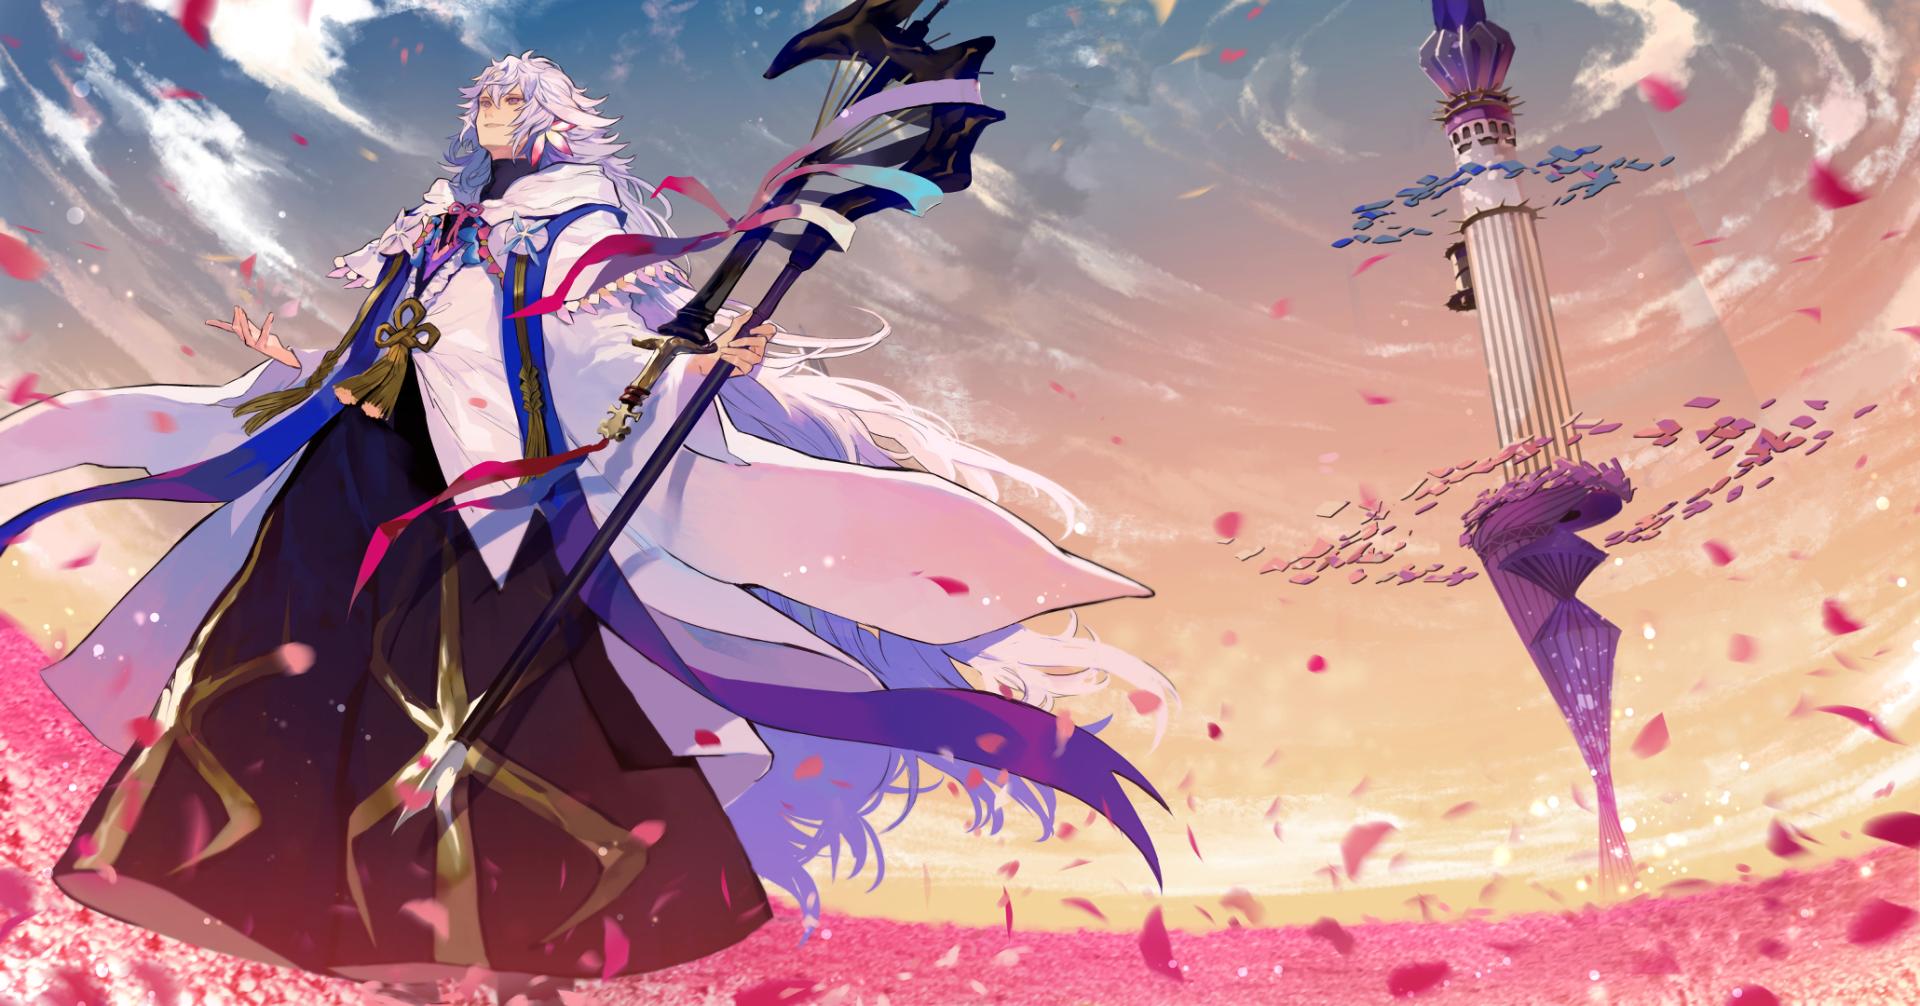 Anime Fate Grand Order Merlin Fate Series Wallpaper